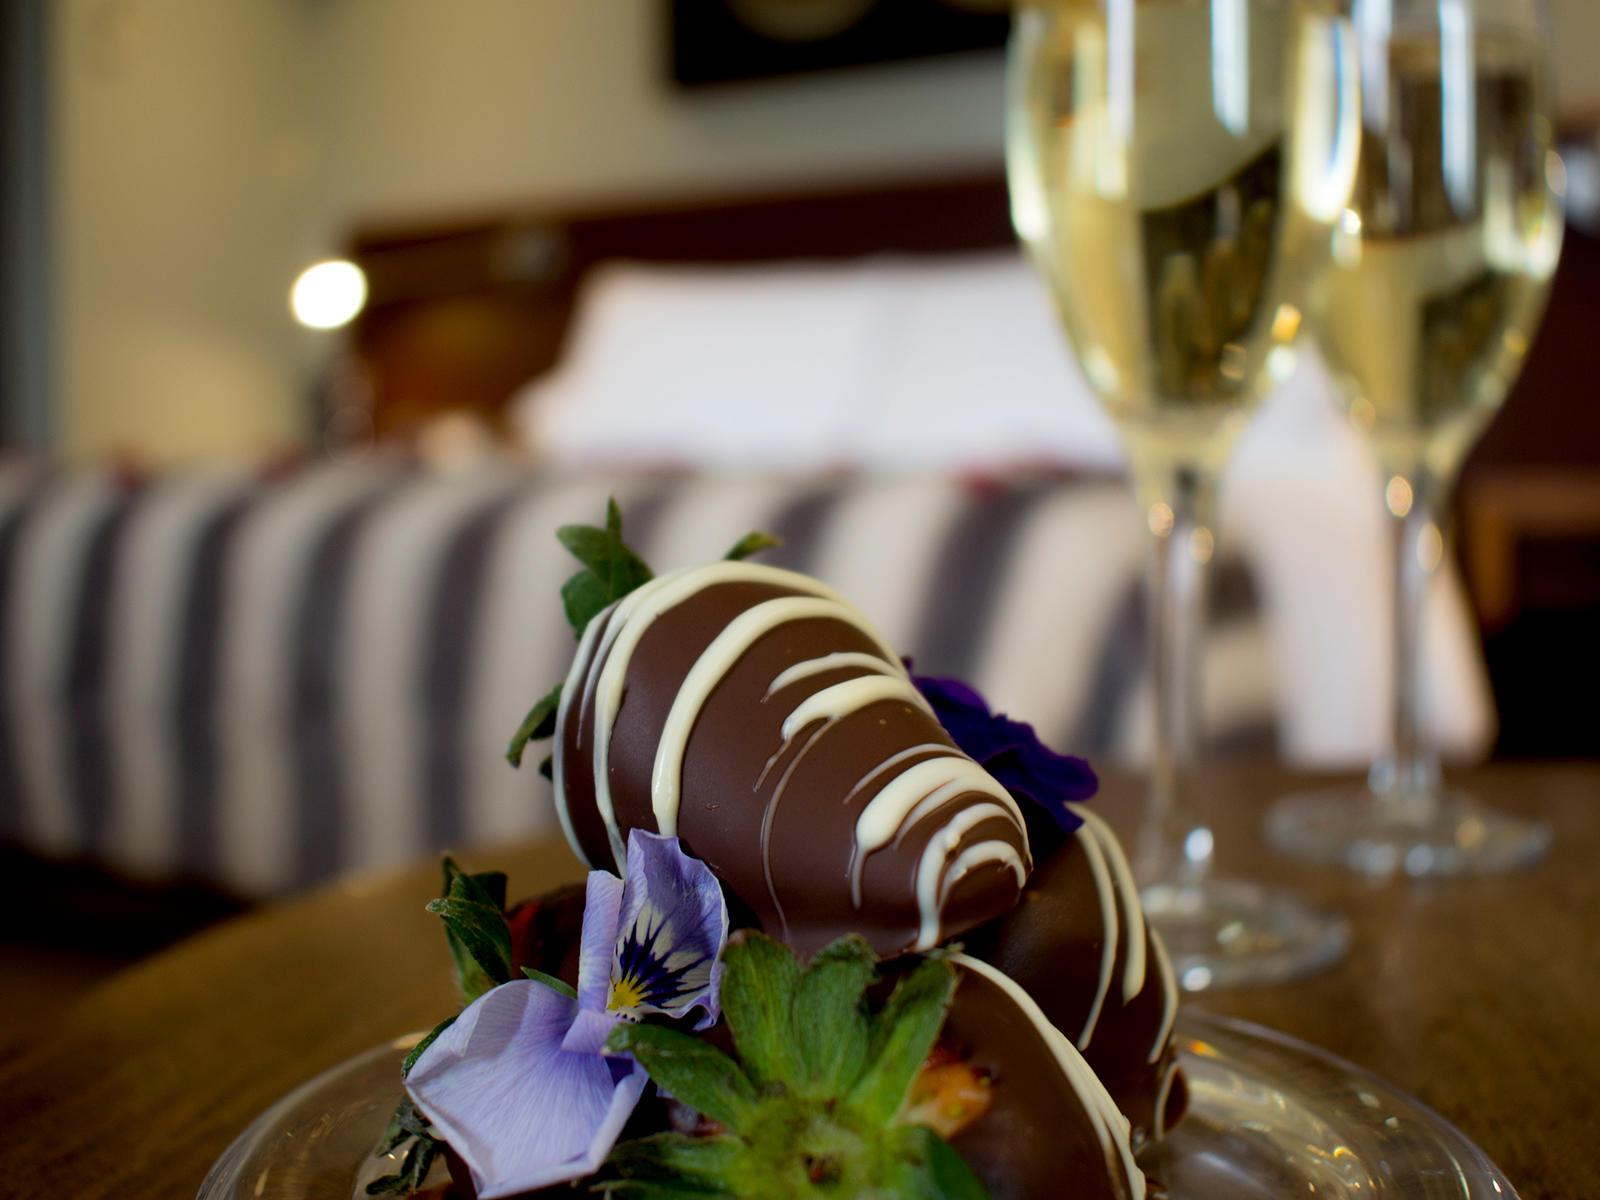 A dessert in Fantastico NOI Luxury at NOI Vitacura hotel